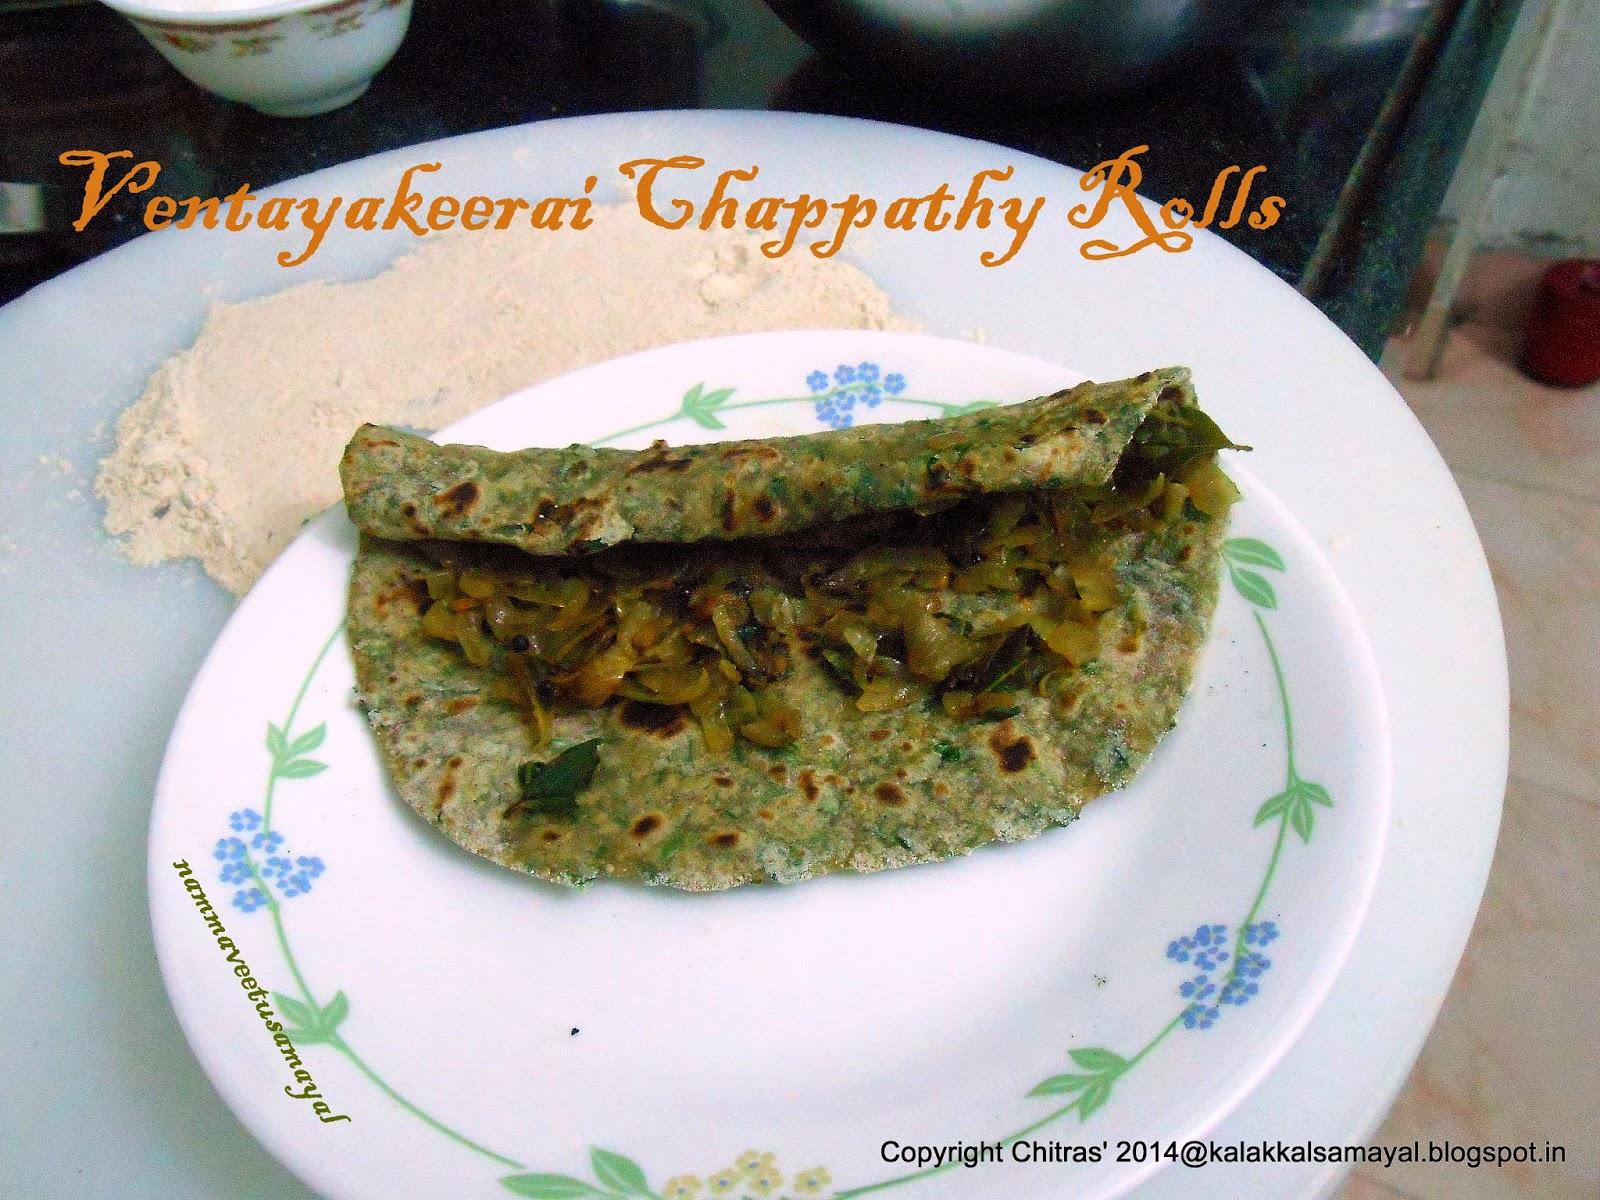 Venthayakeerai Chappathy [ Fenugreek leaves chappathy ]